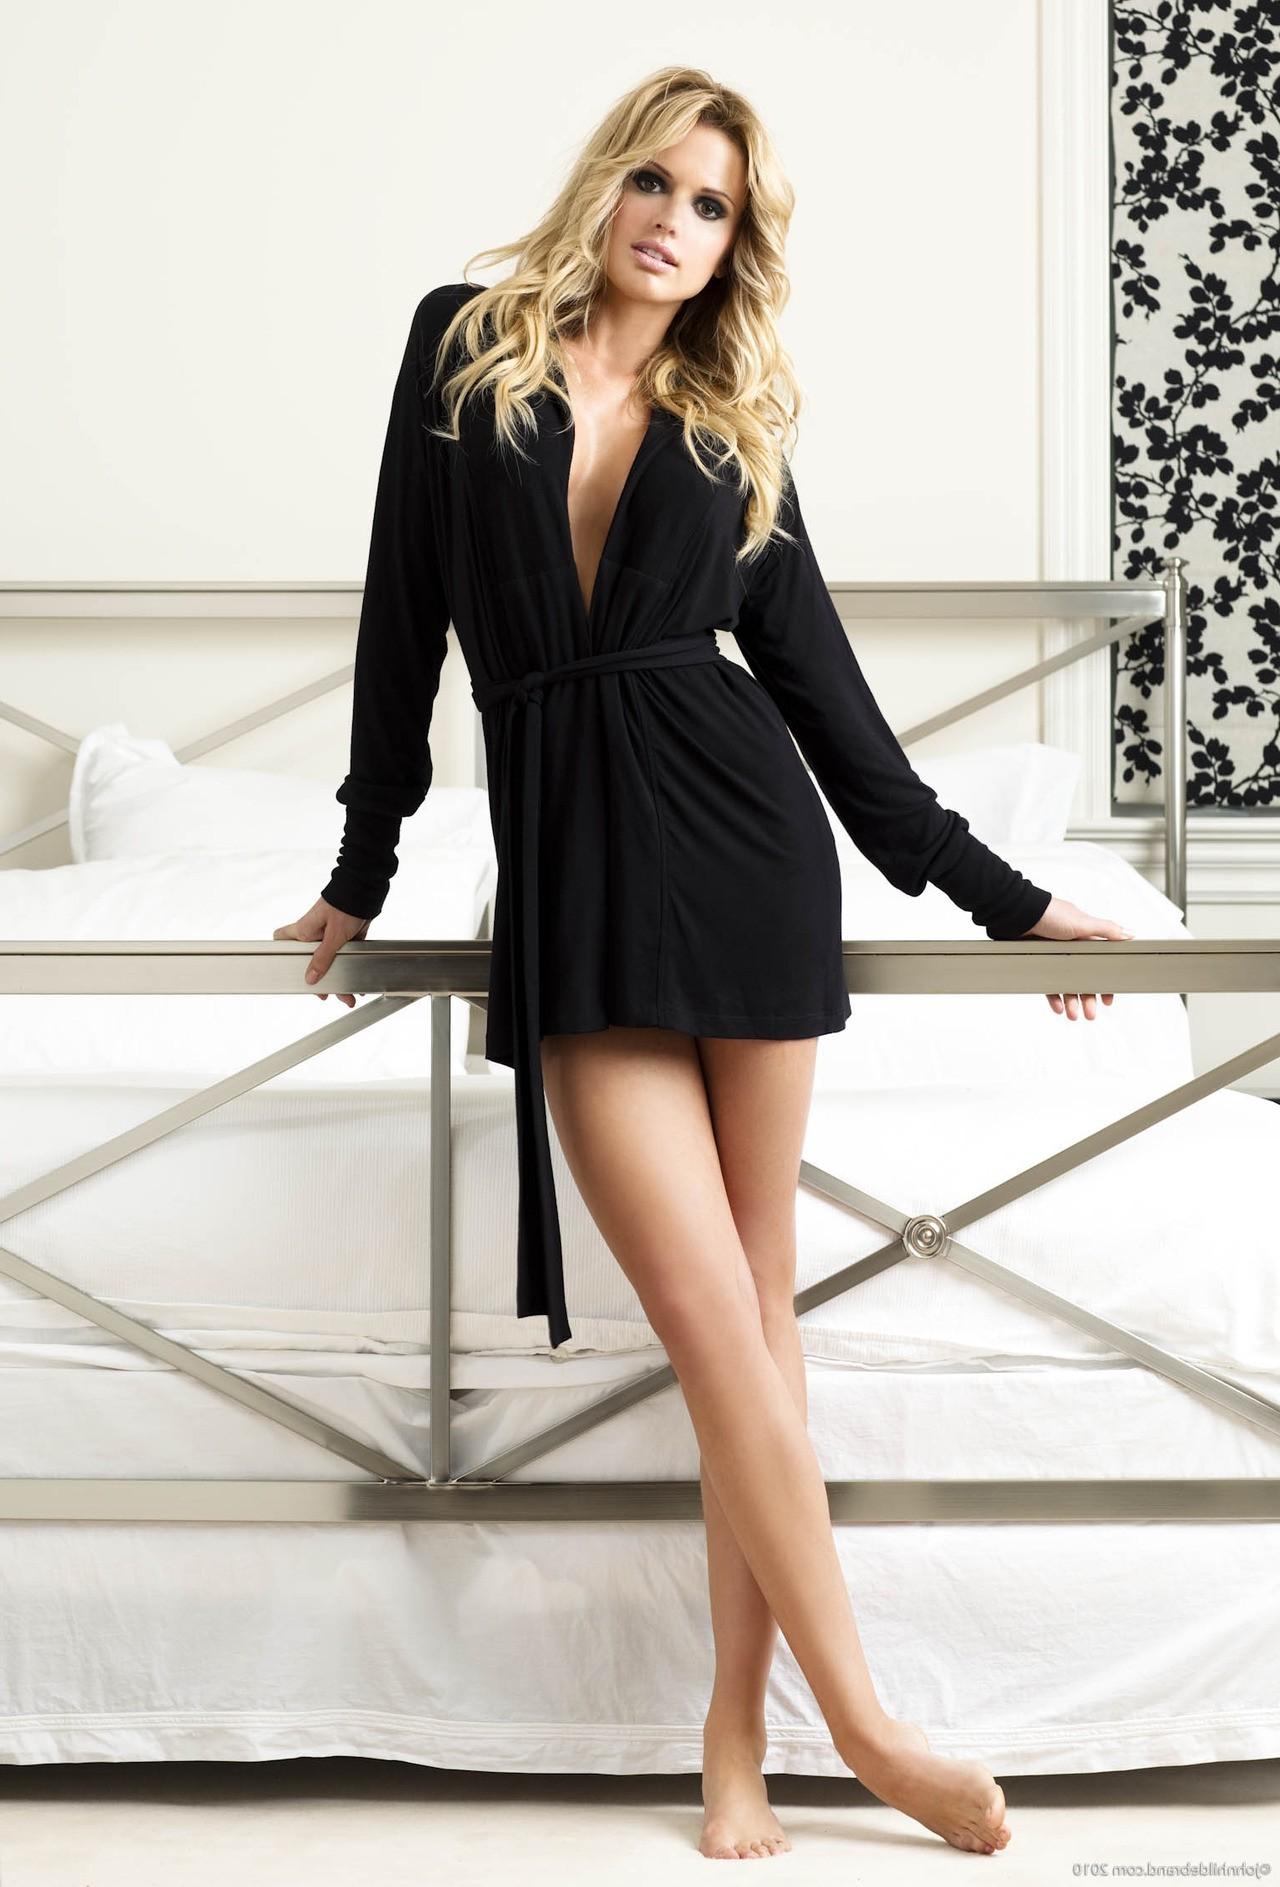 Hintergrundbilder : Modell-, blond, lange Haare, Mode, Minirock ...